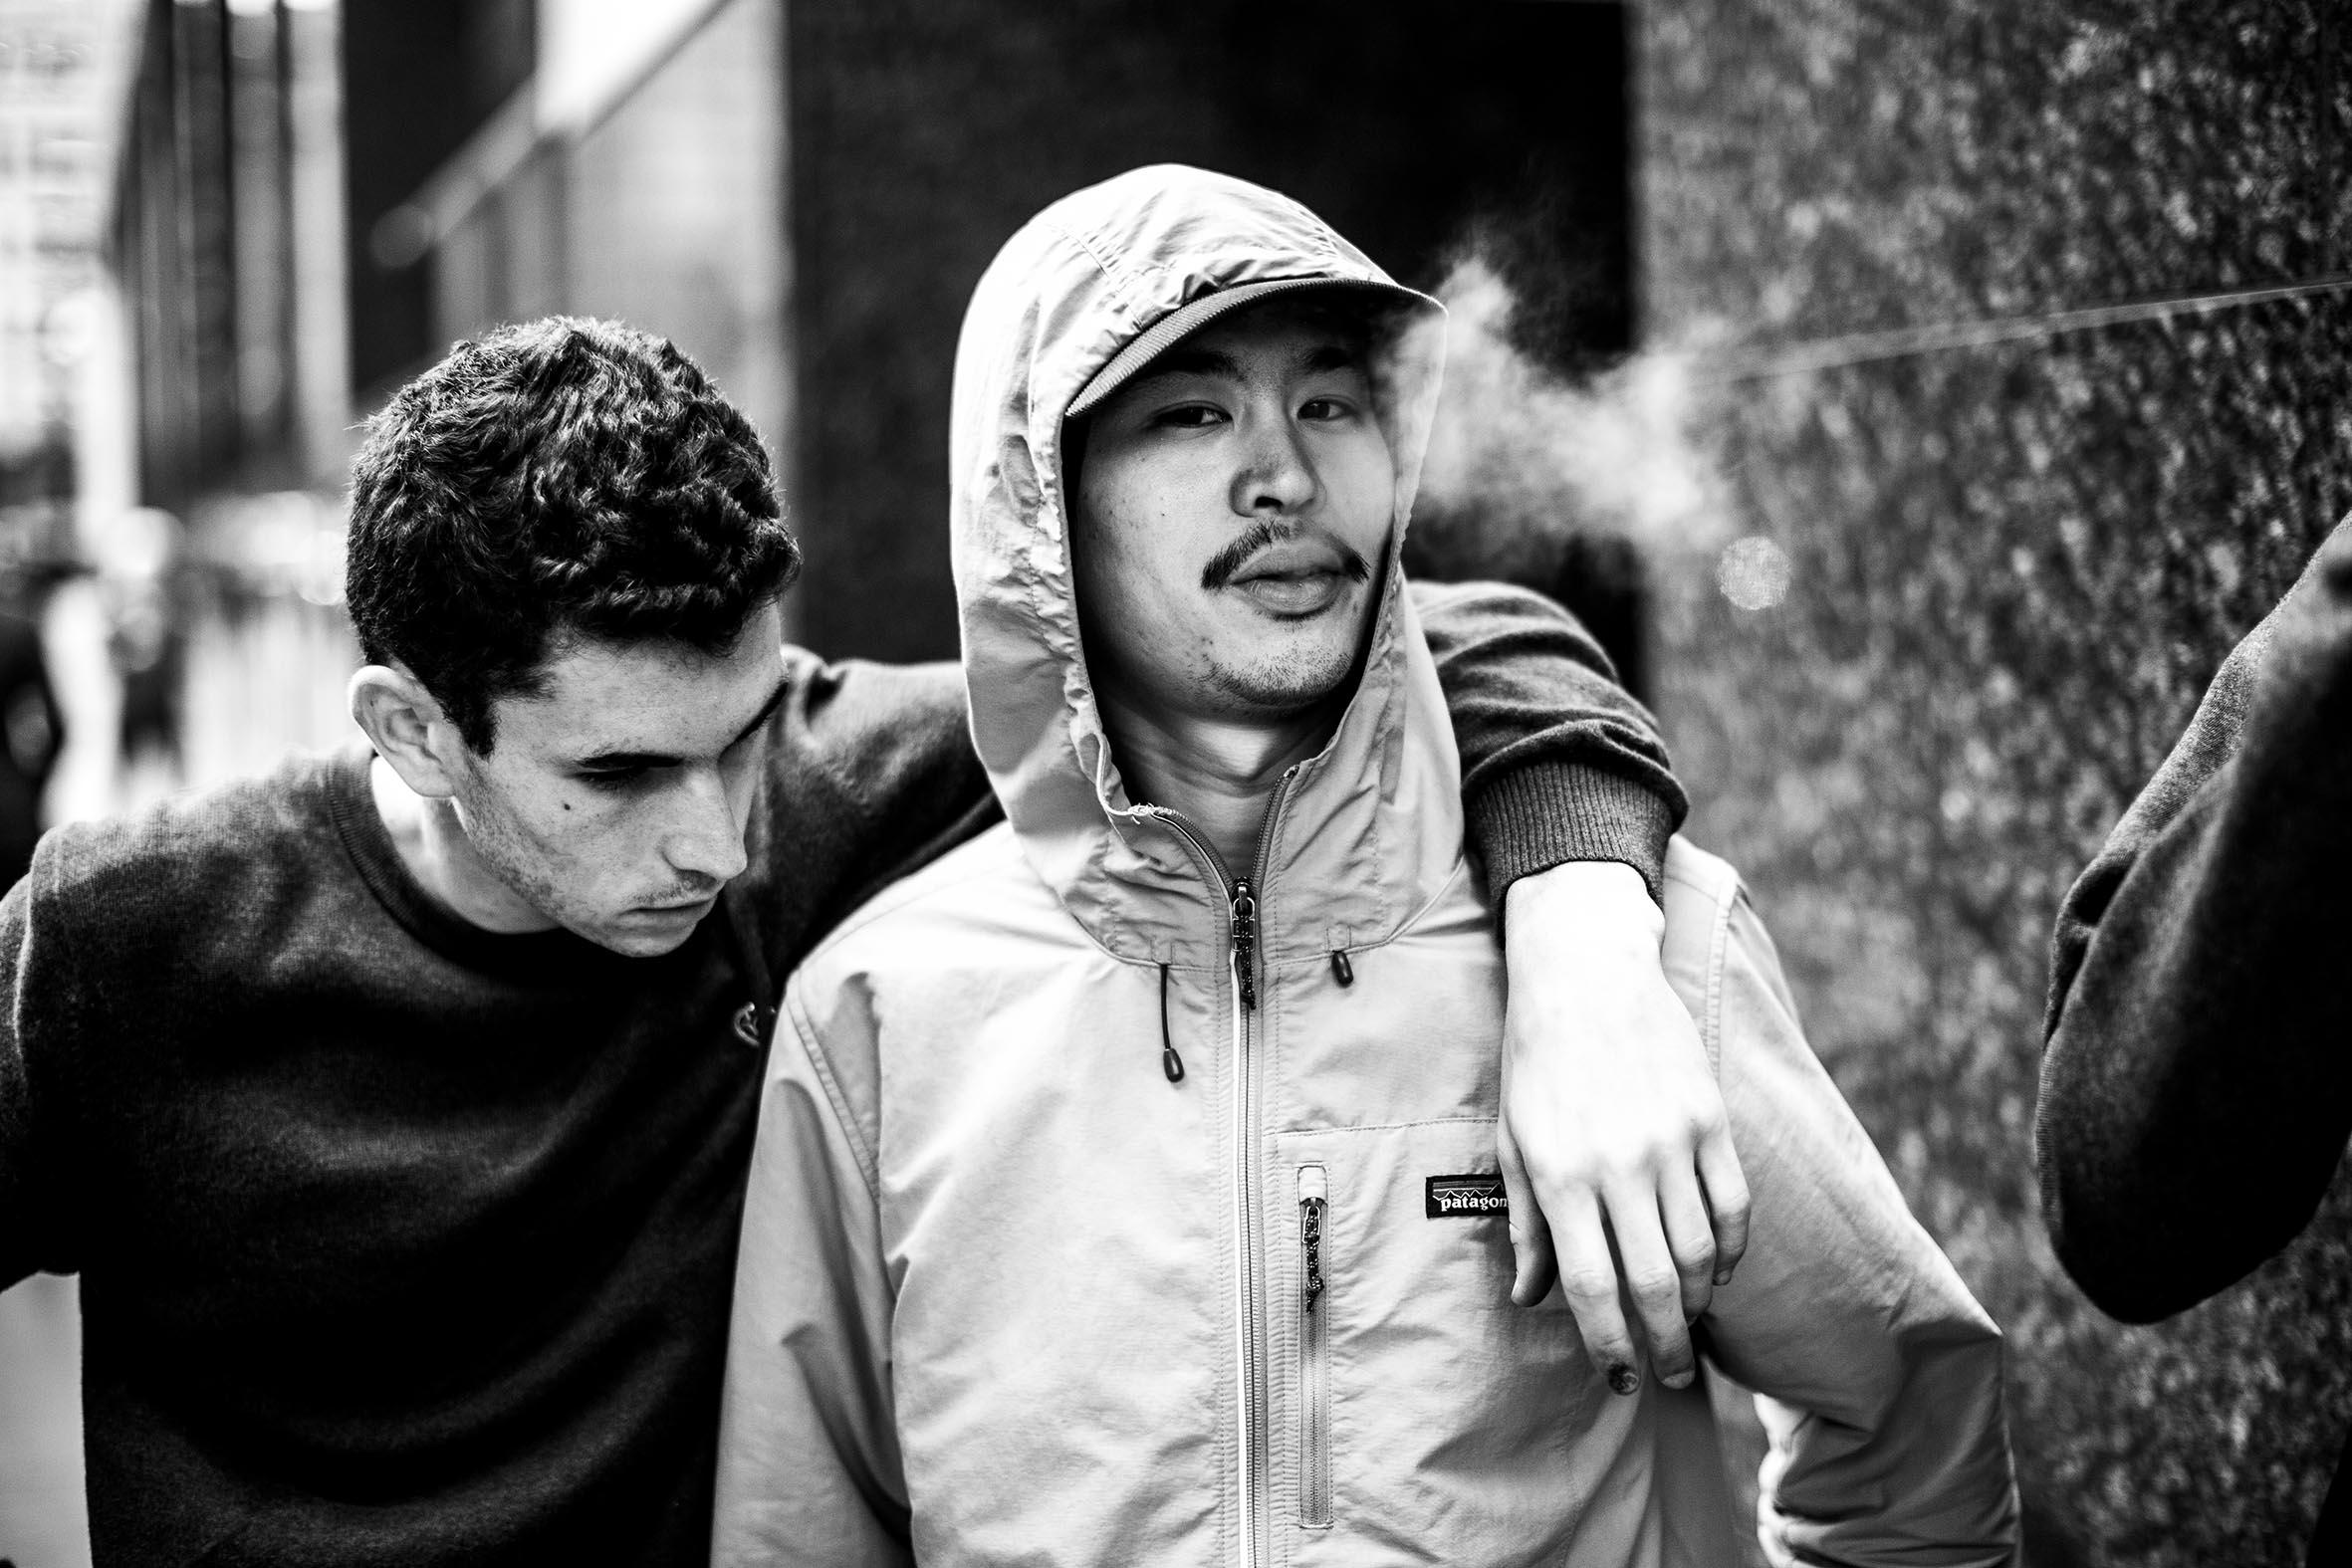 Franky Spears & Justin Albert